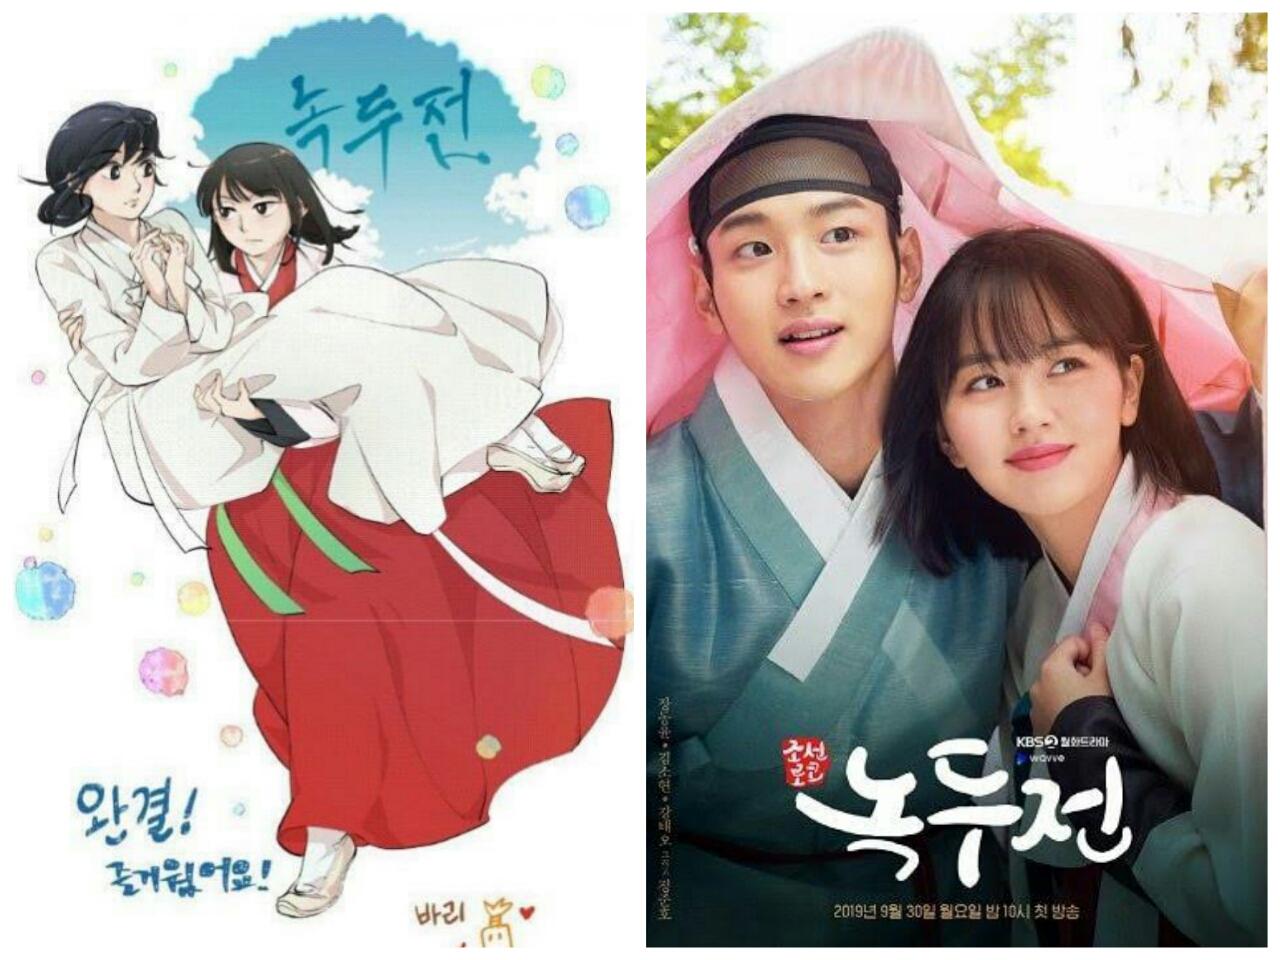 3 Drama Korea Adaptasi Webtoon Yang Tayang Musim Gugur 2019 Petak Imaji